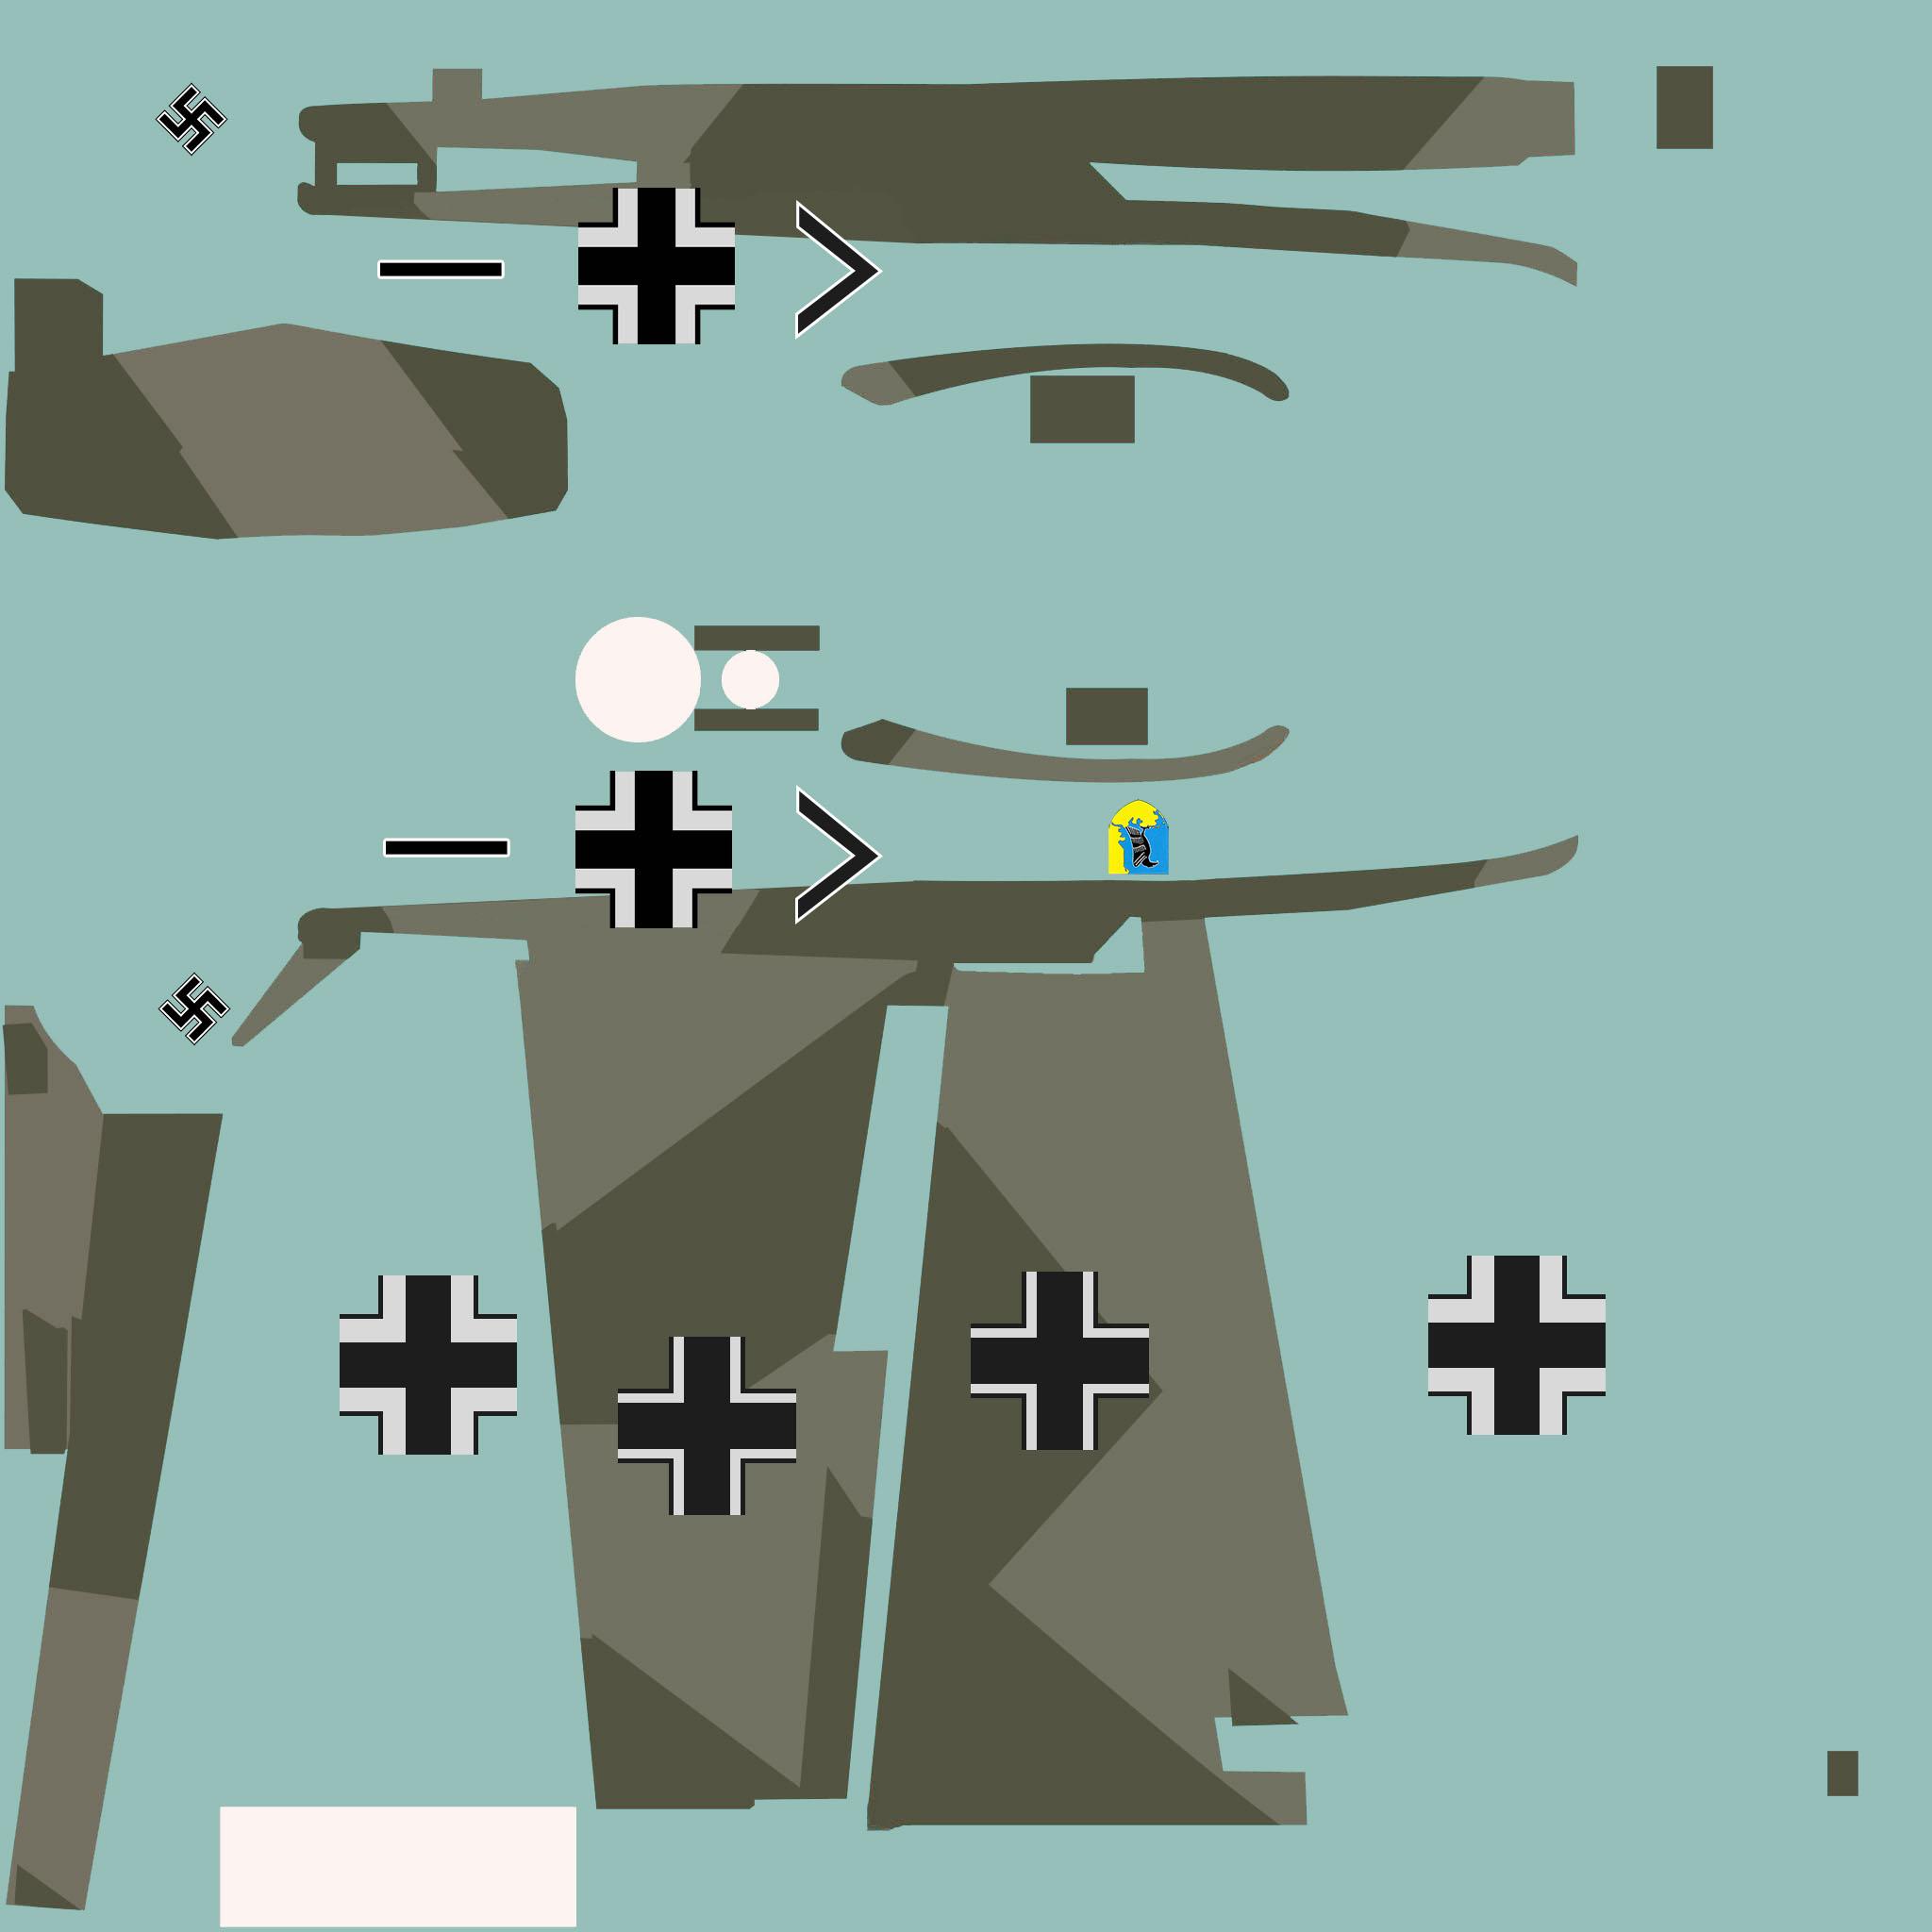 COD asisbiz Bf 109E1 Stab JG1 Karl Schumacher White Prop and one emblem